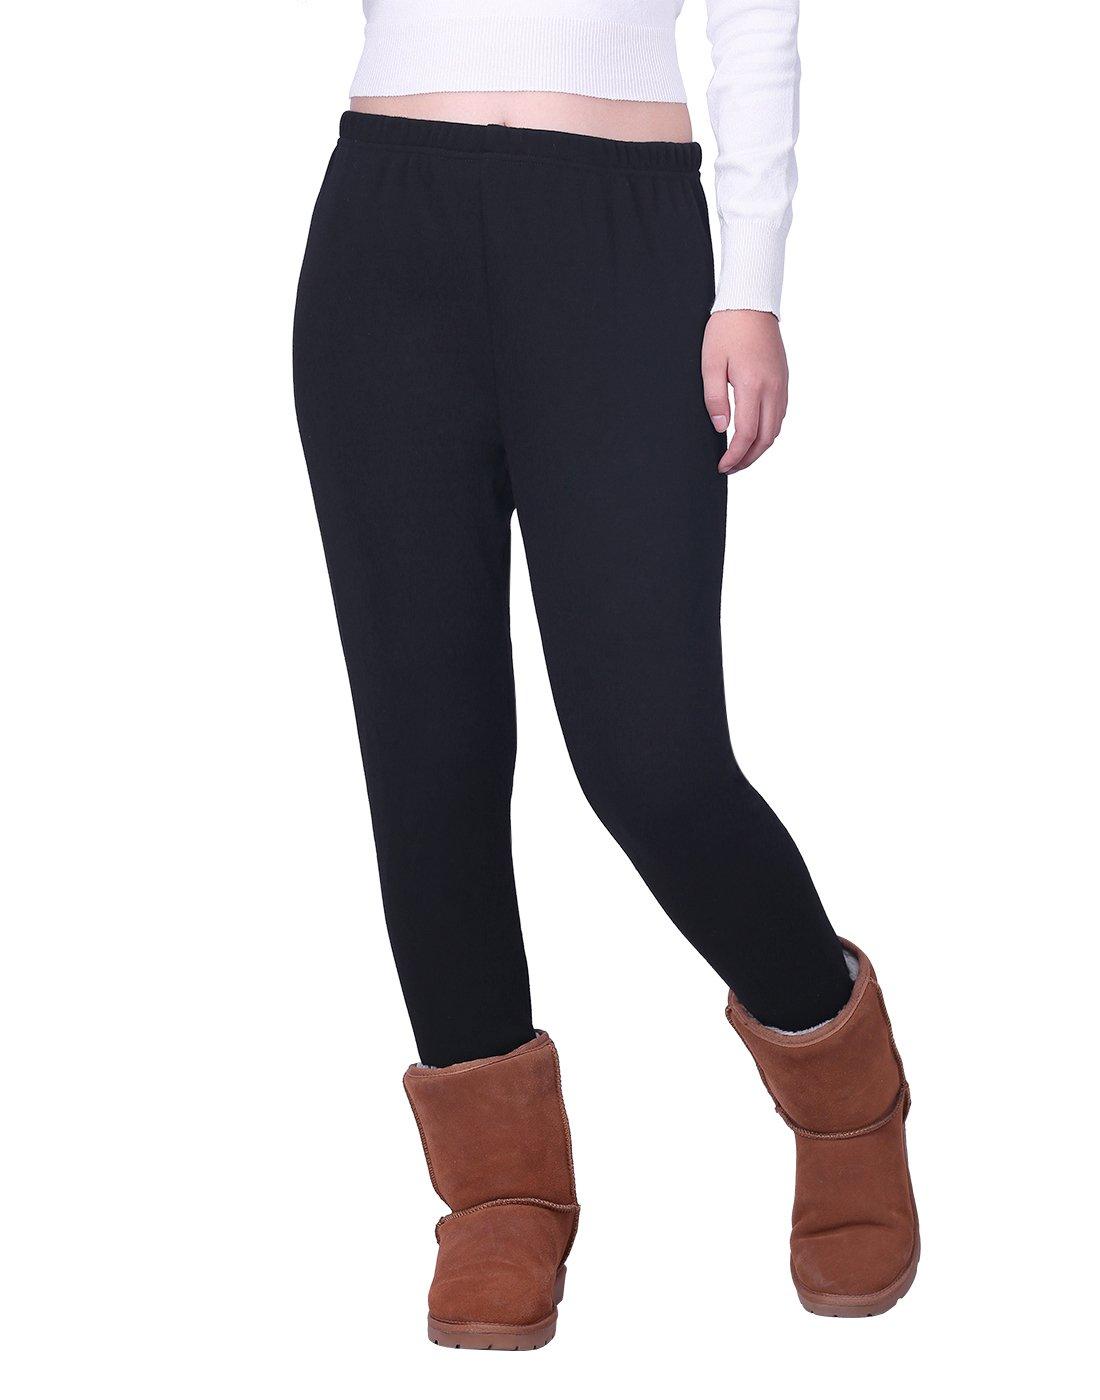 HDE Women's Winter Leggings Warm Fleece Lined Thermal High Waist Patterned Pants,Black,Large (US 12-14)